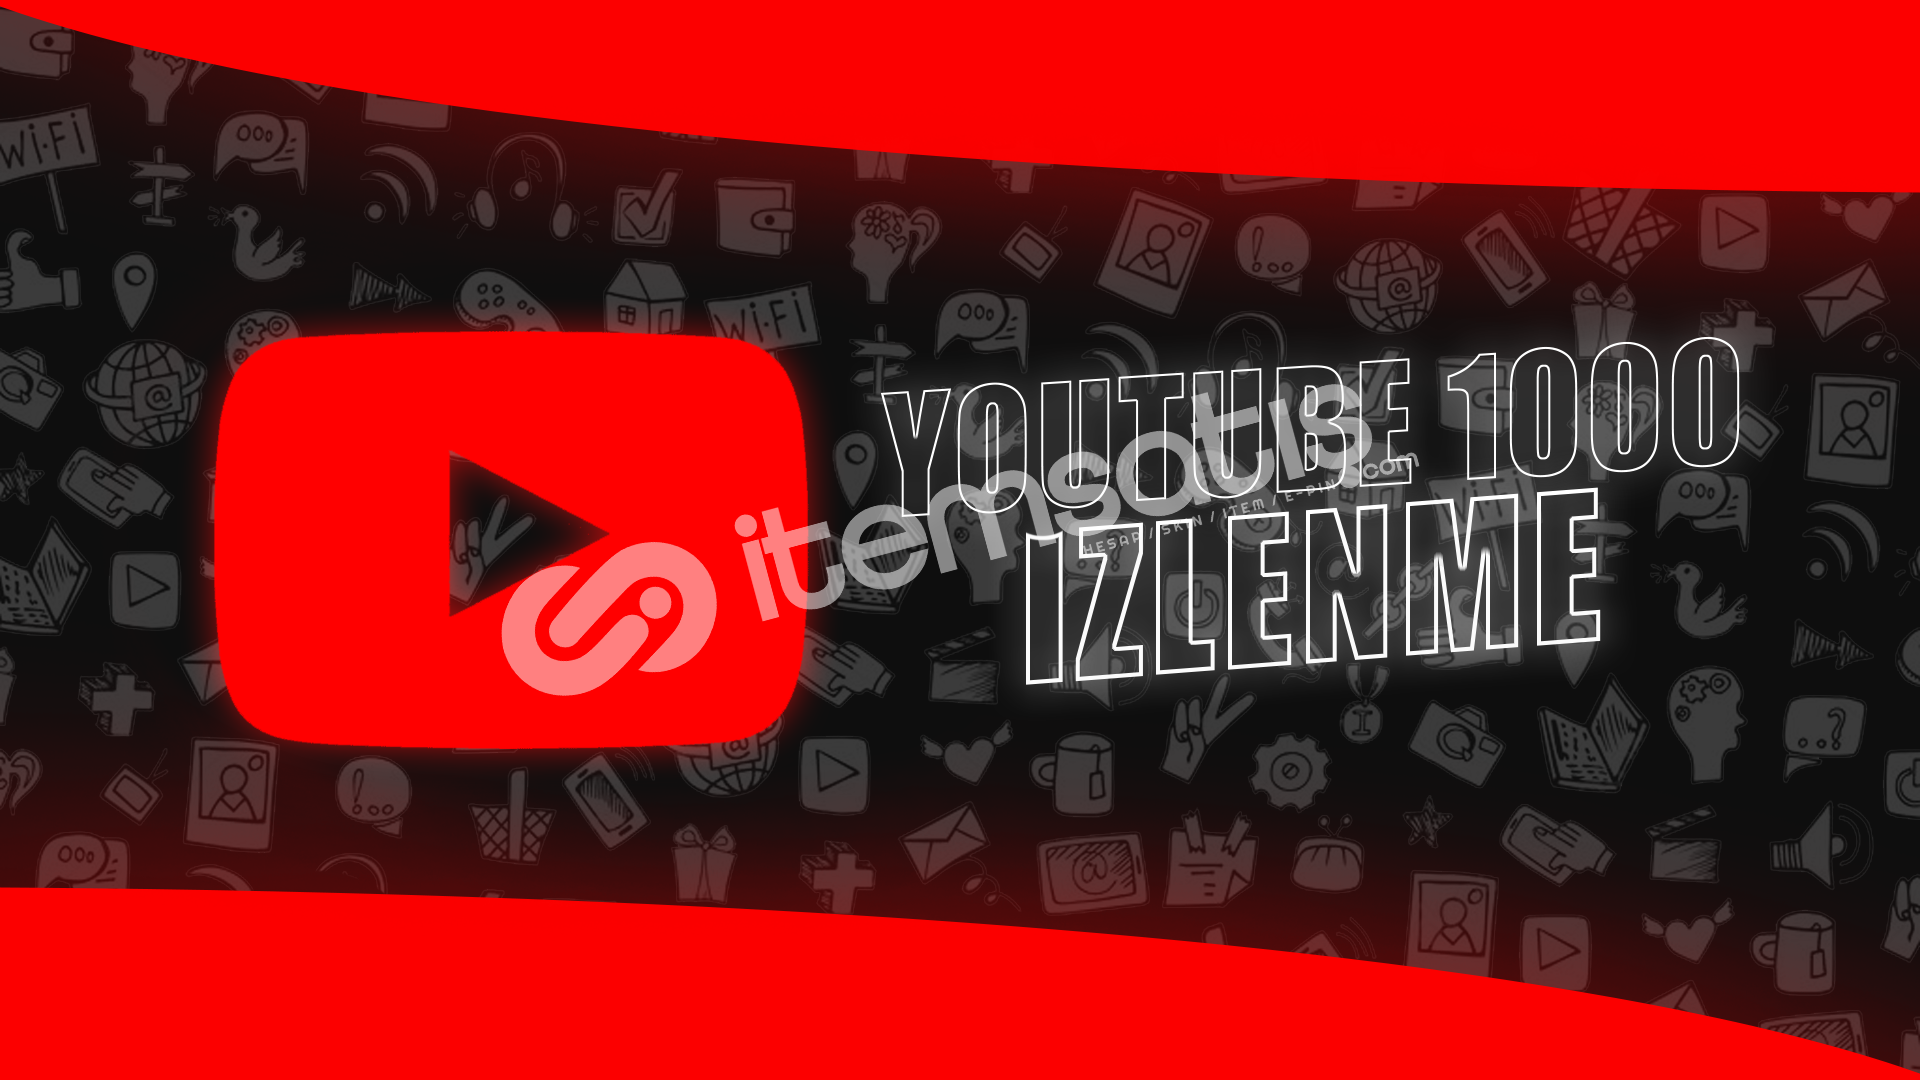 Çalışan Tek Servis - YouTube 1000 İzlenme - 6TL